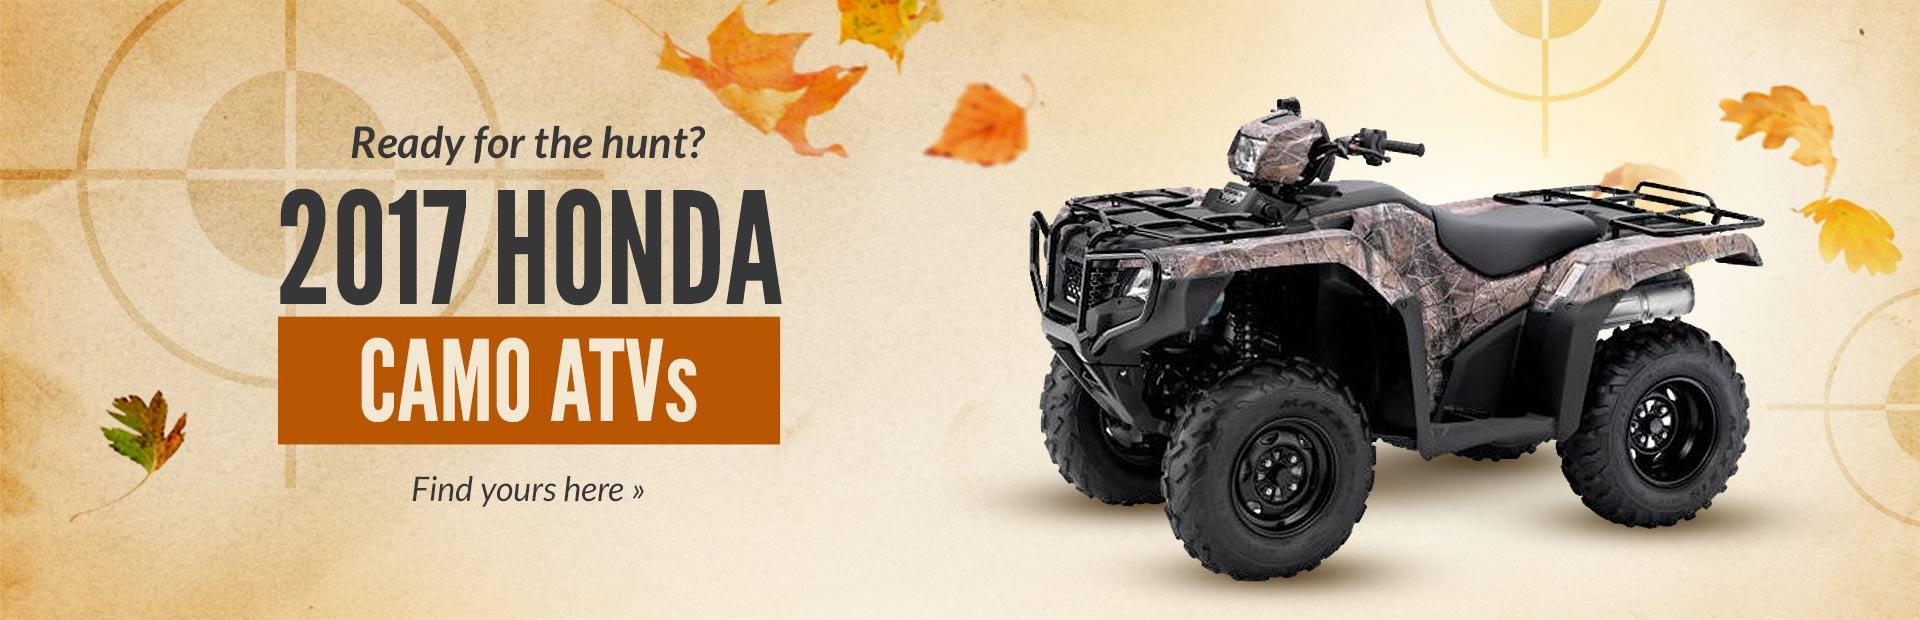 2017 Honda Camo ATVs: Click here to view the lineup.